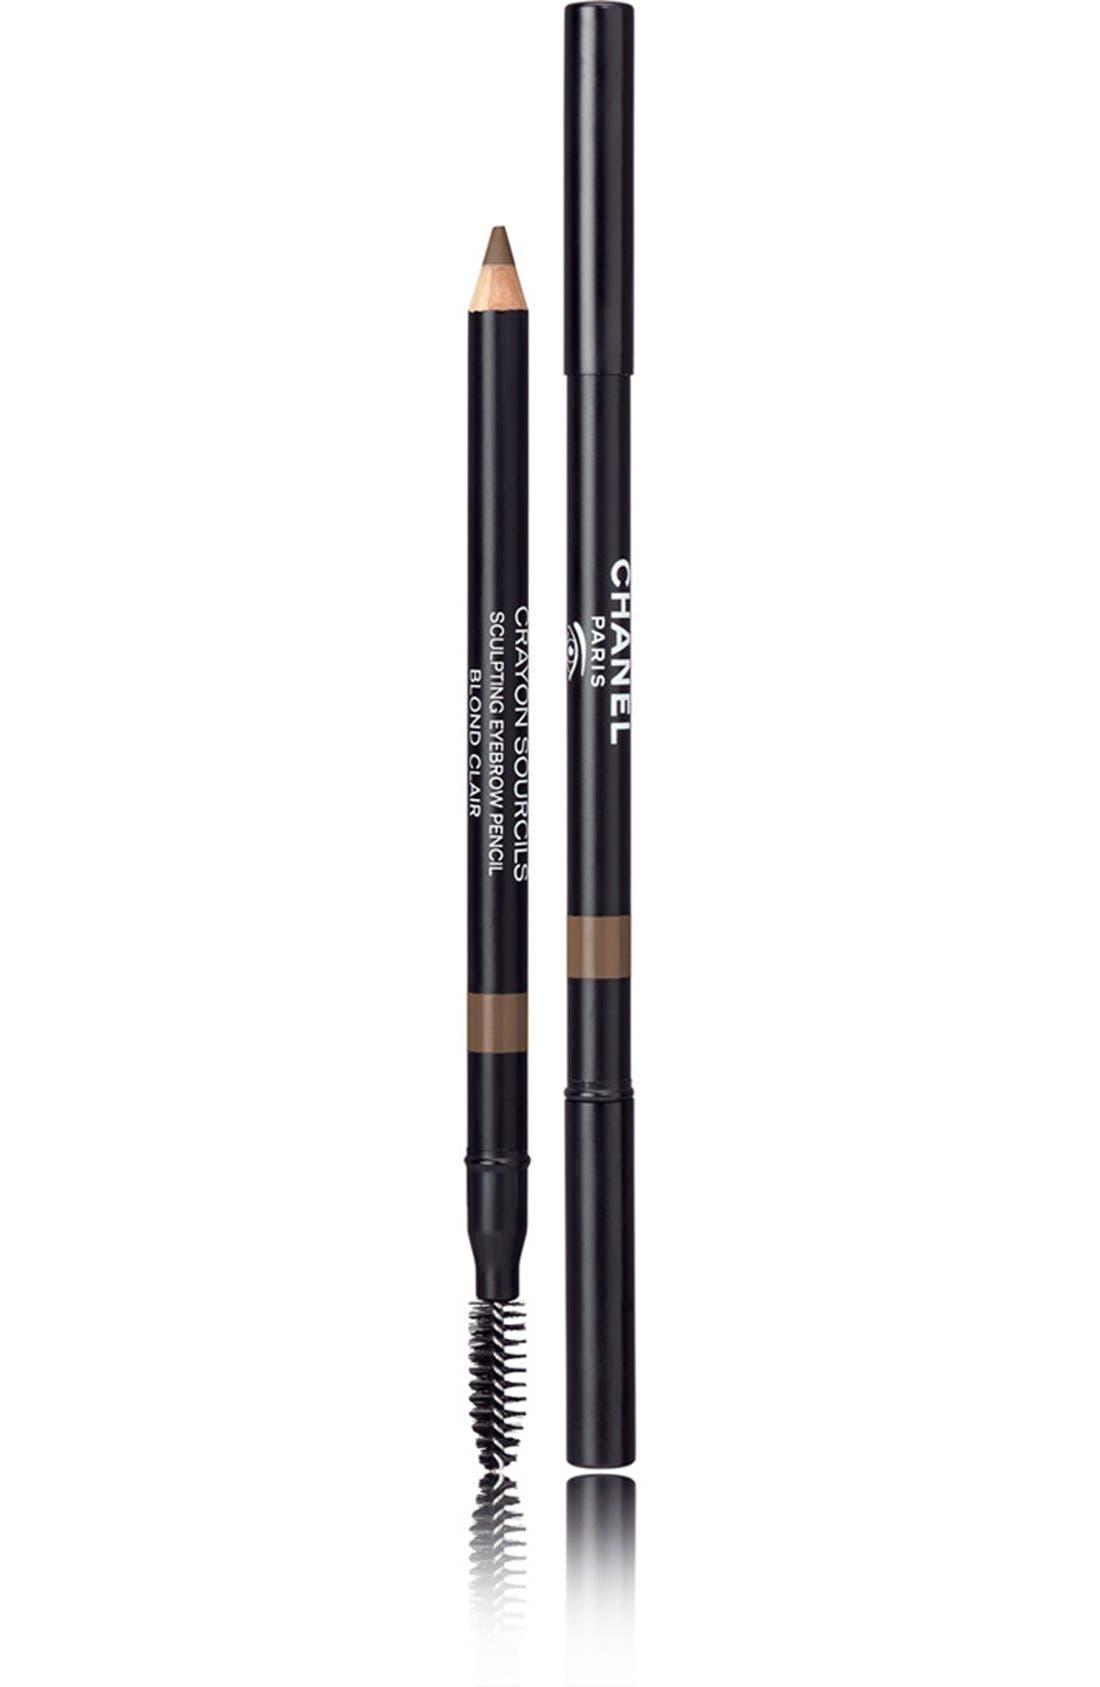 CRAYON SOURCILS<br />Sculpting Eyebrow Pencil,                         Main,                         color, 30 BRUN NATUREL